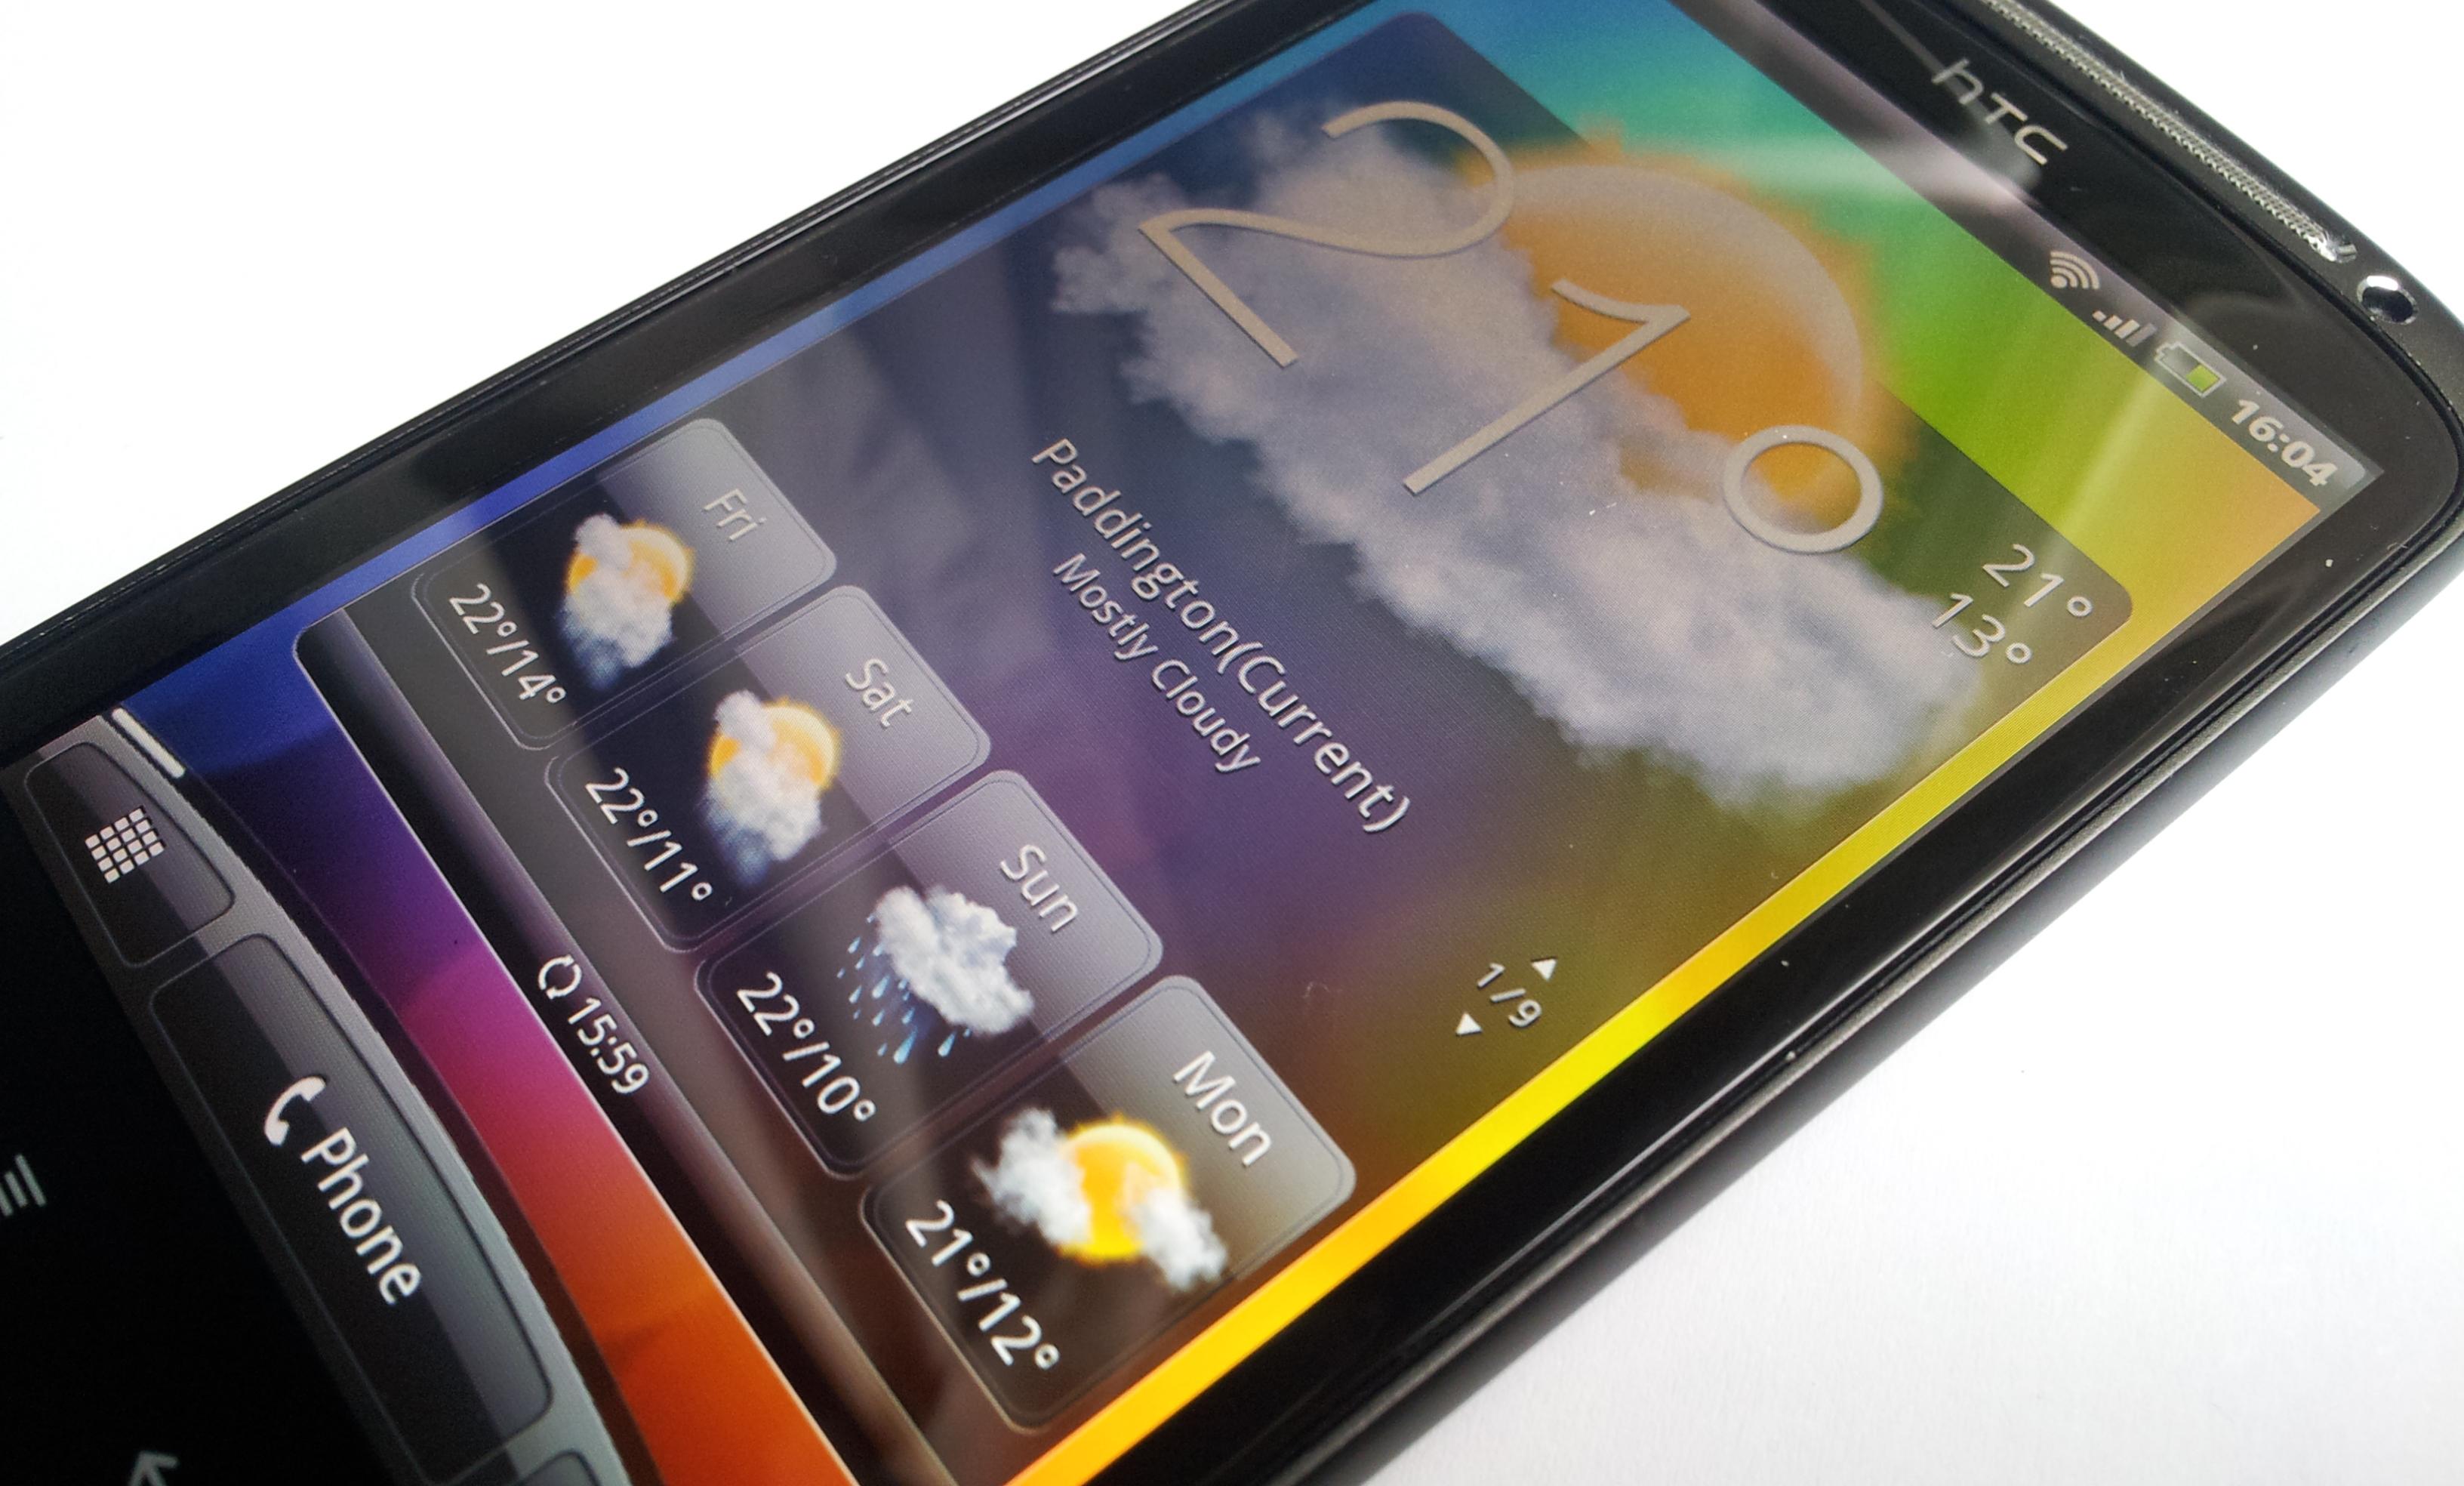 HTC Sensation con oficial ROM ICS +Root